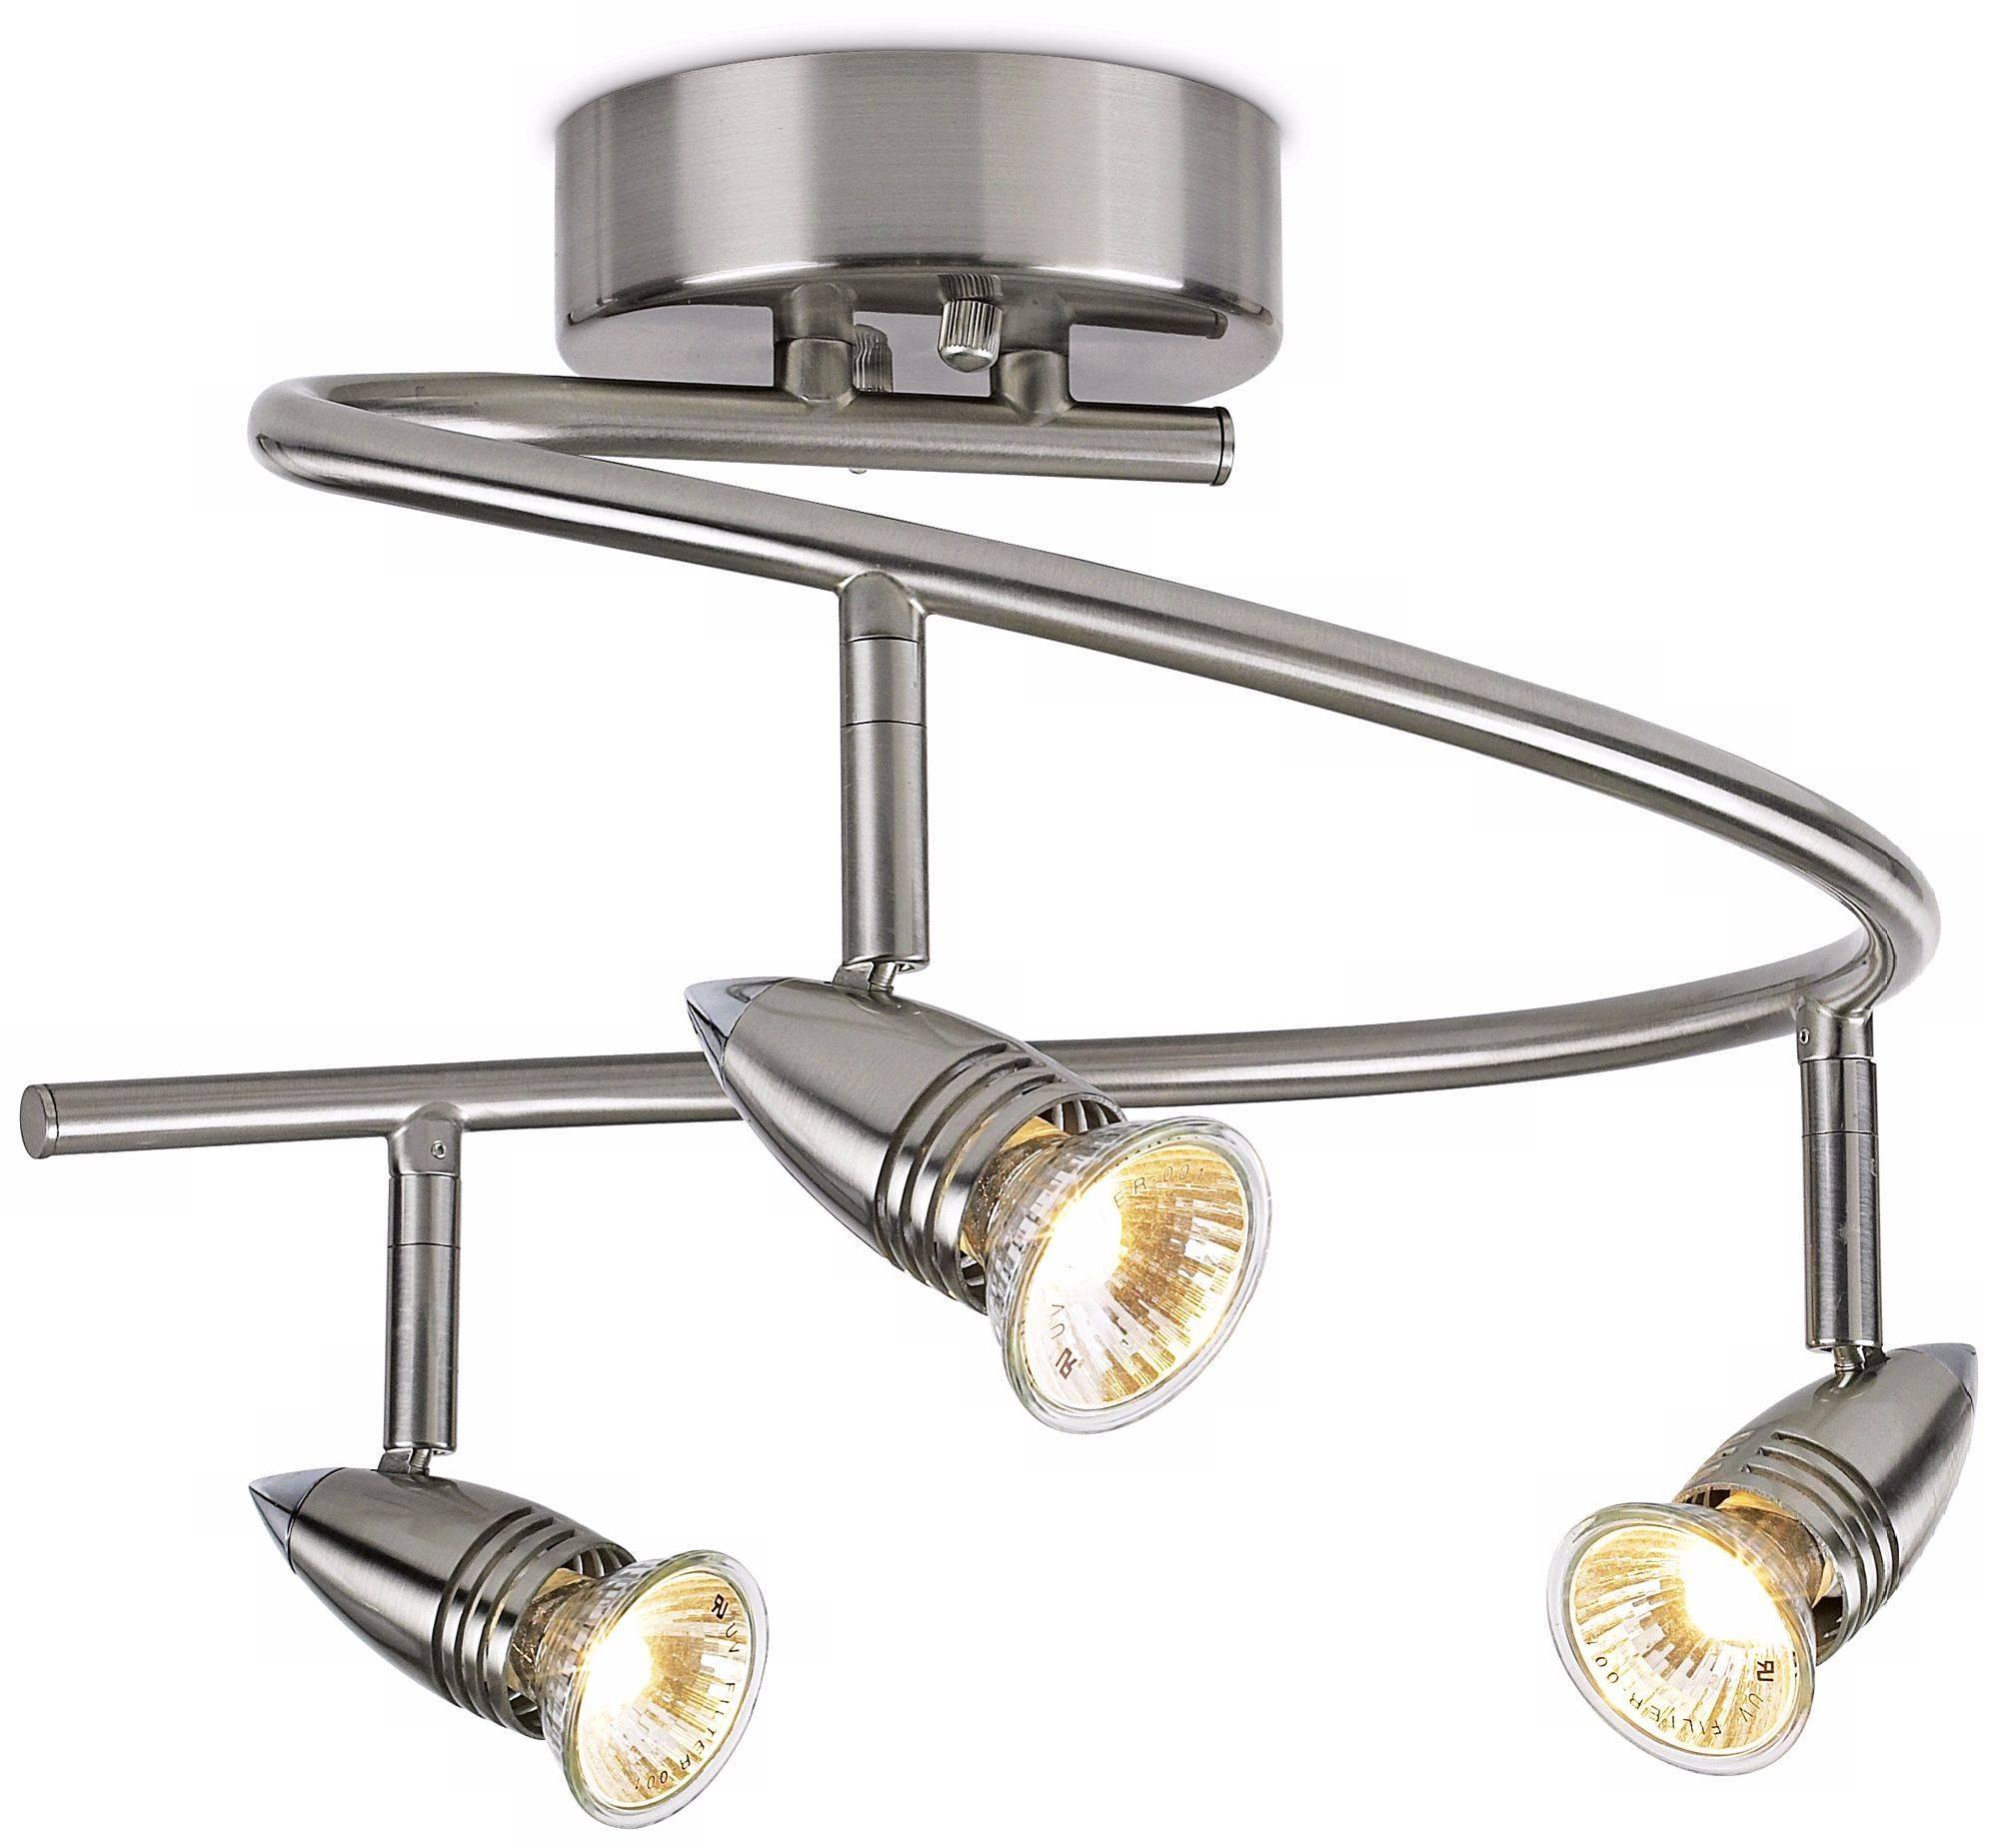 Good Lightolier Led Track Lighting 69 On Light In The Box Track My inside Lights in the Box Lighting (Image 6 of 12)